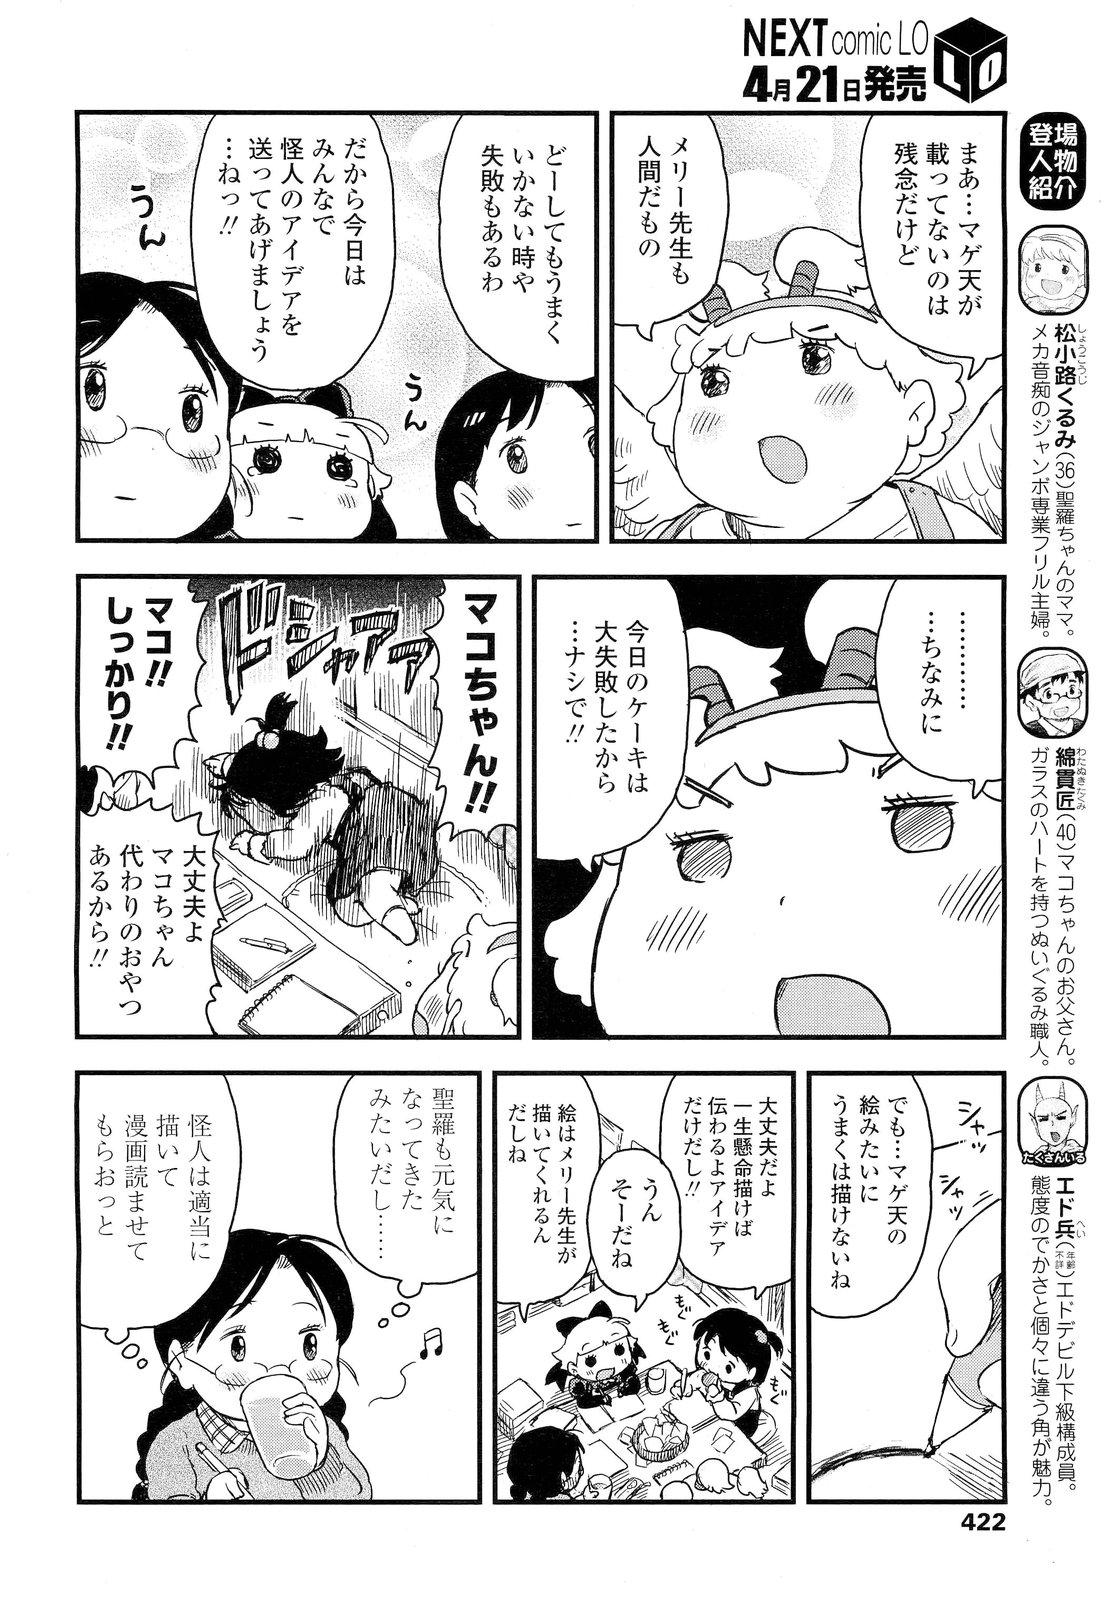 COMIC LO 2012-05 Vol. 98 421